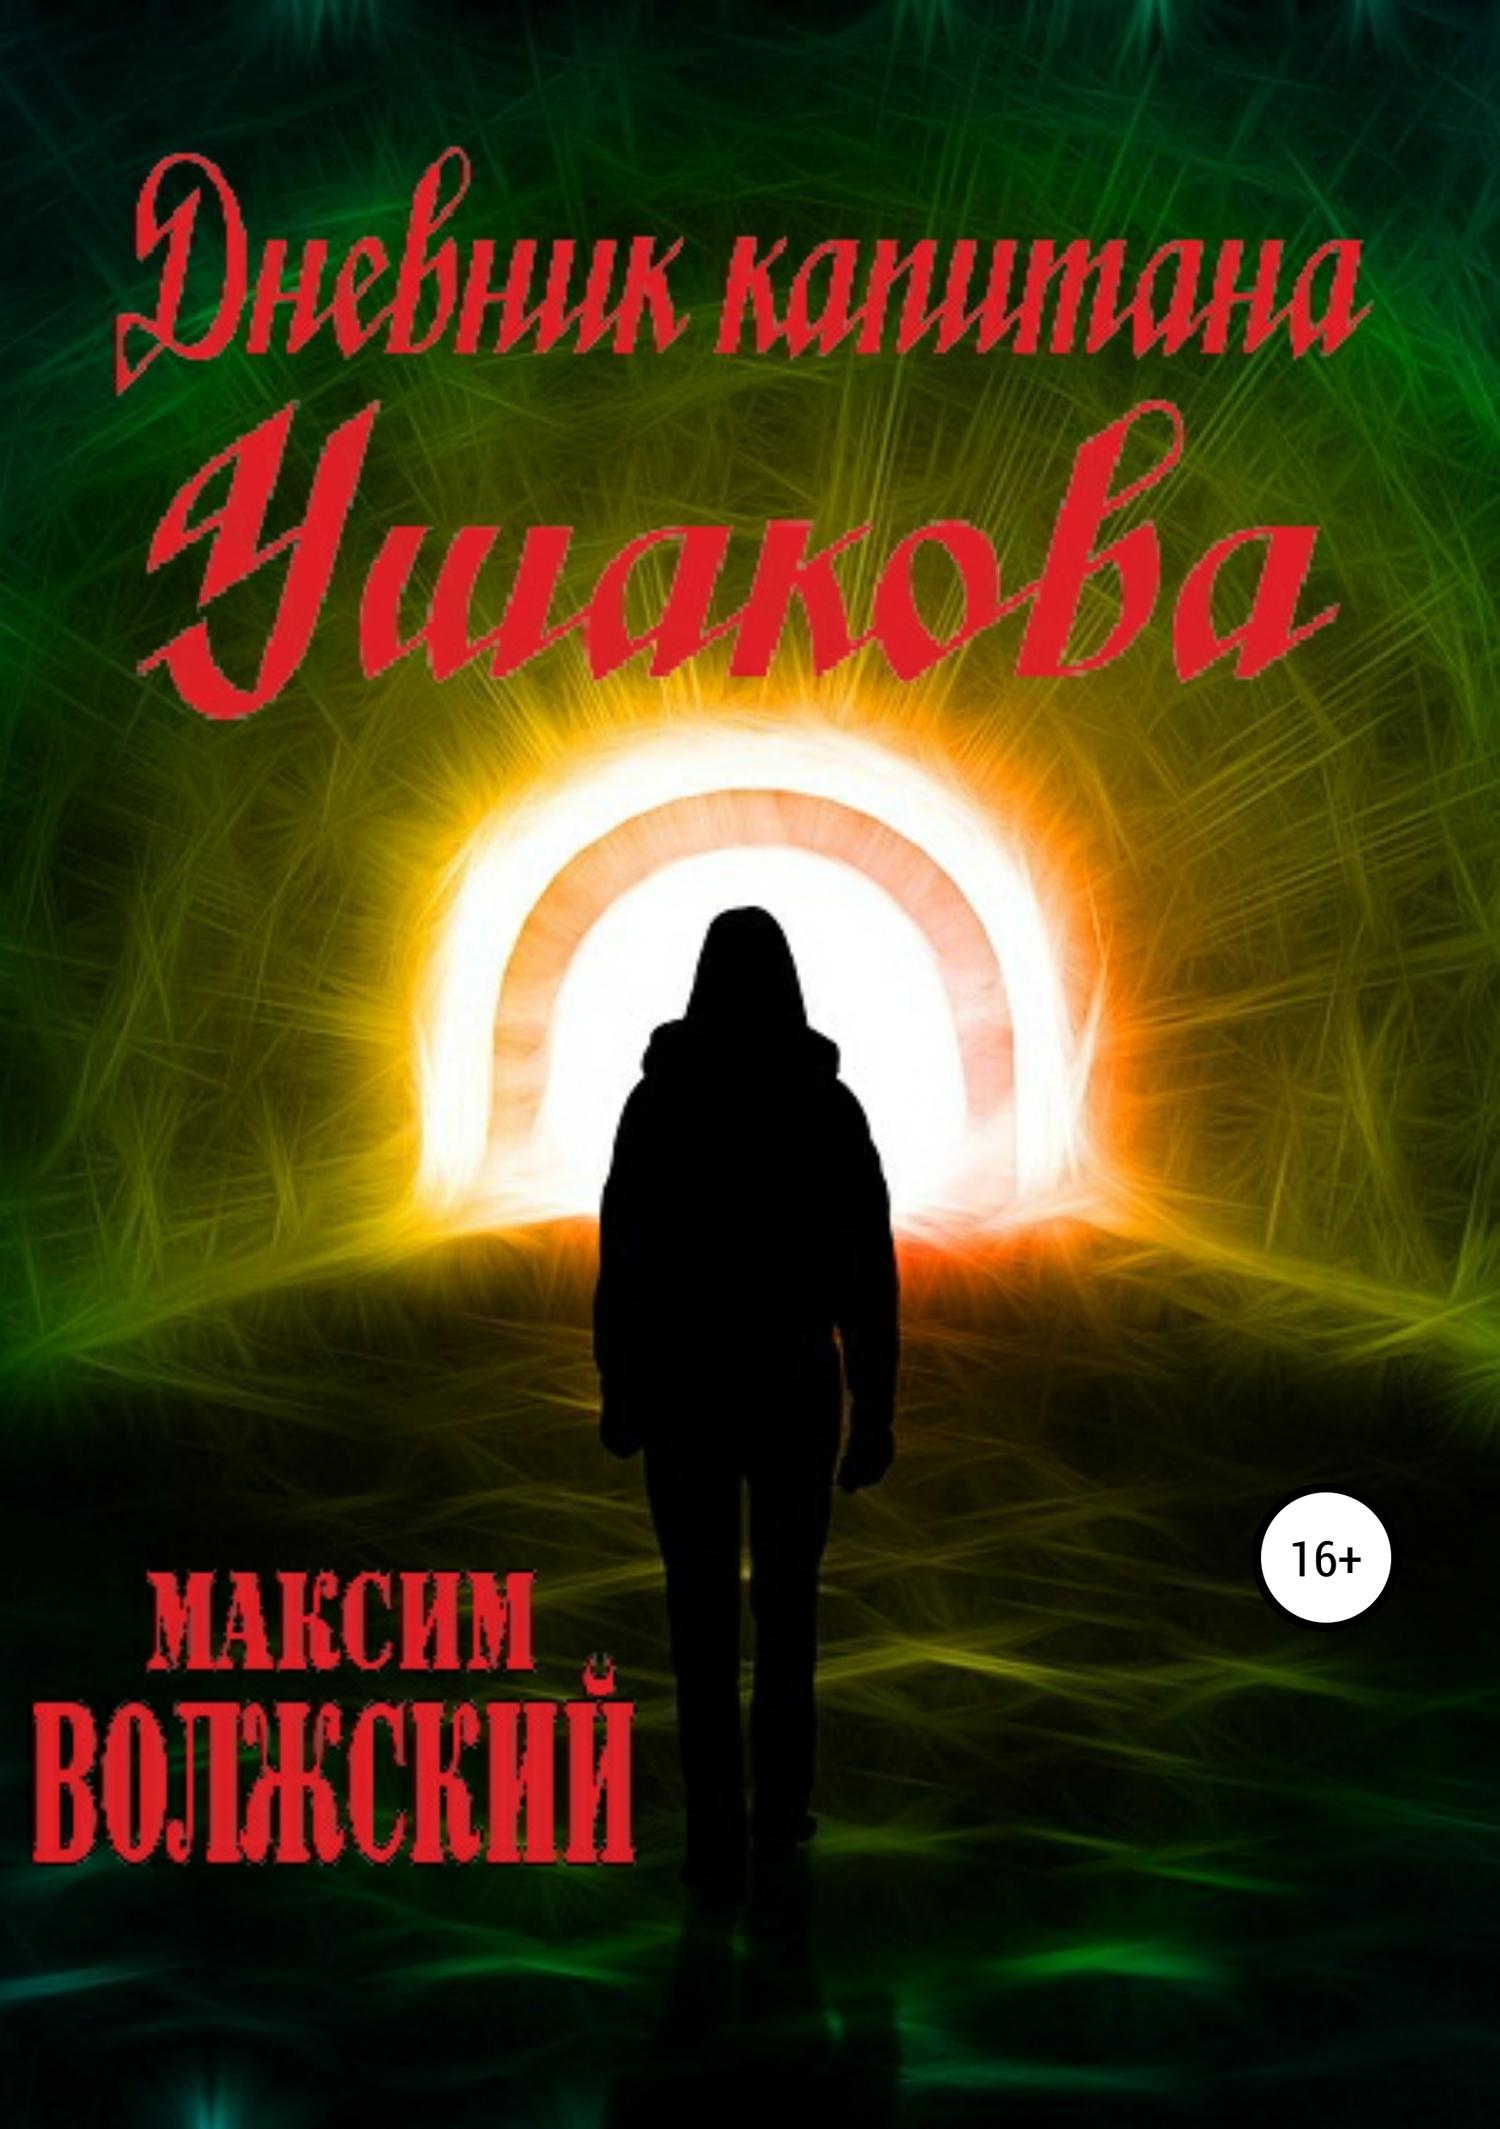 Дневник капитана Ушакова